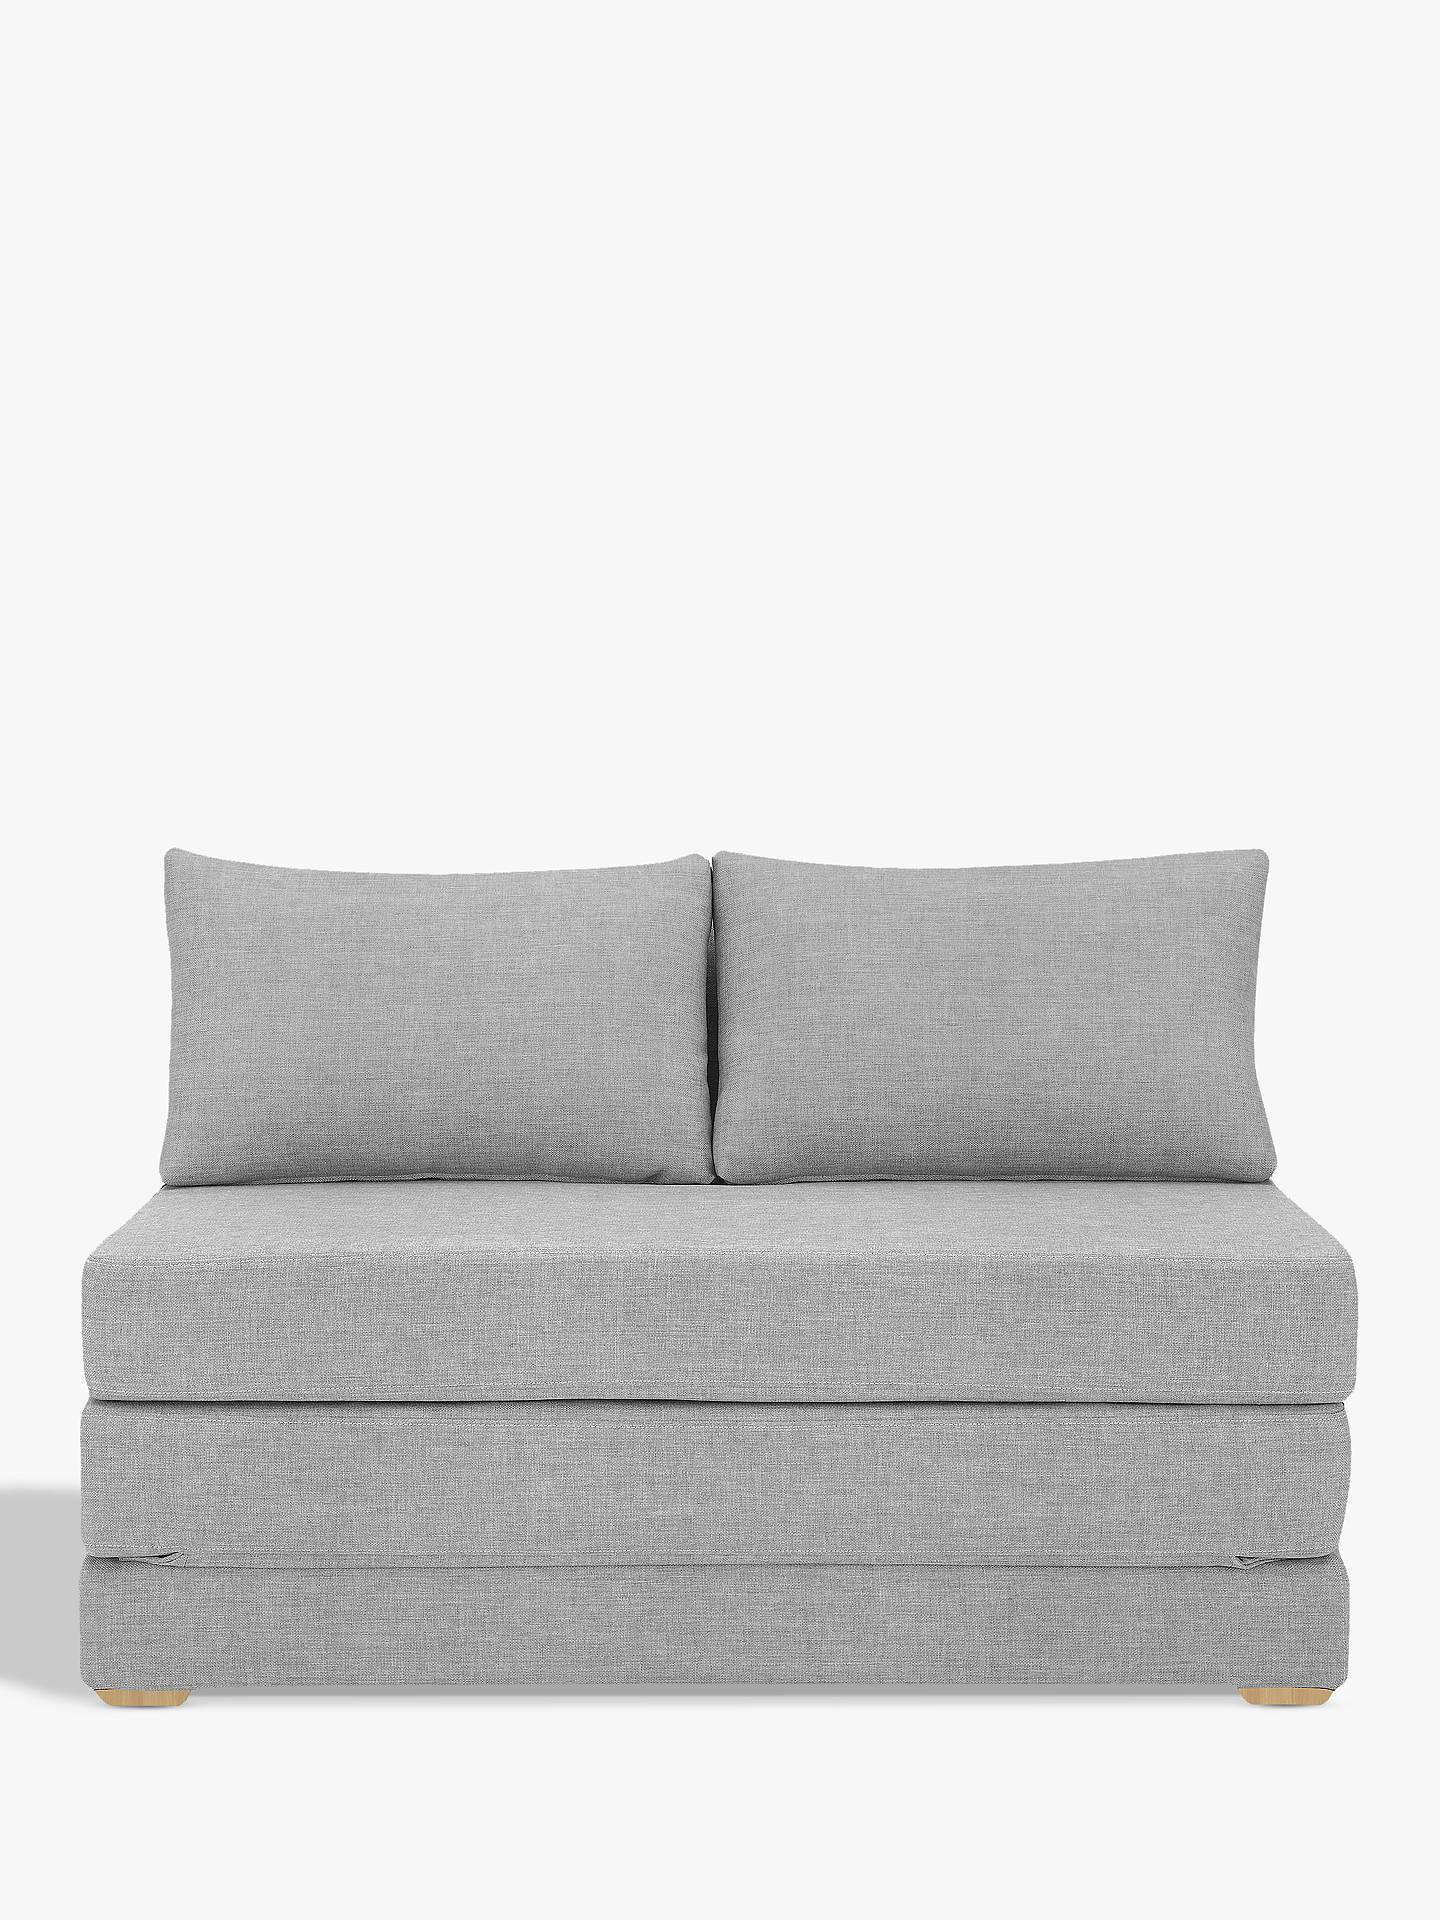 house by john lewis kip small sofa bed with foam mattress at john rh johnlewis com foam sofa bed mattress foam sofa bed mattress